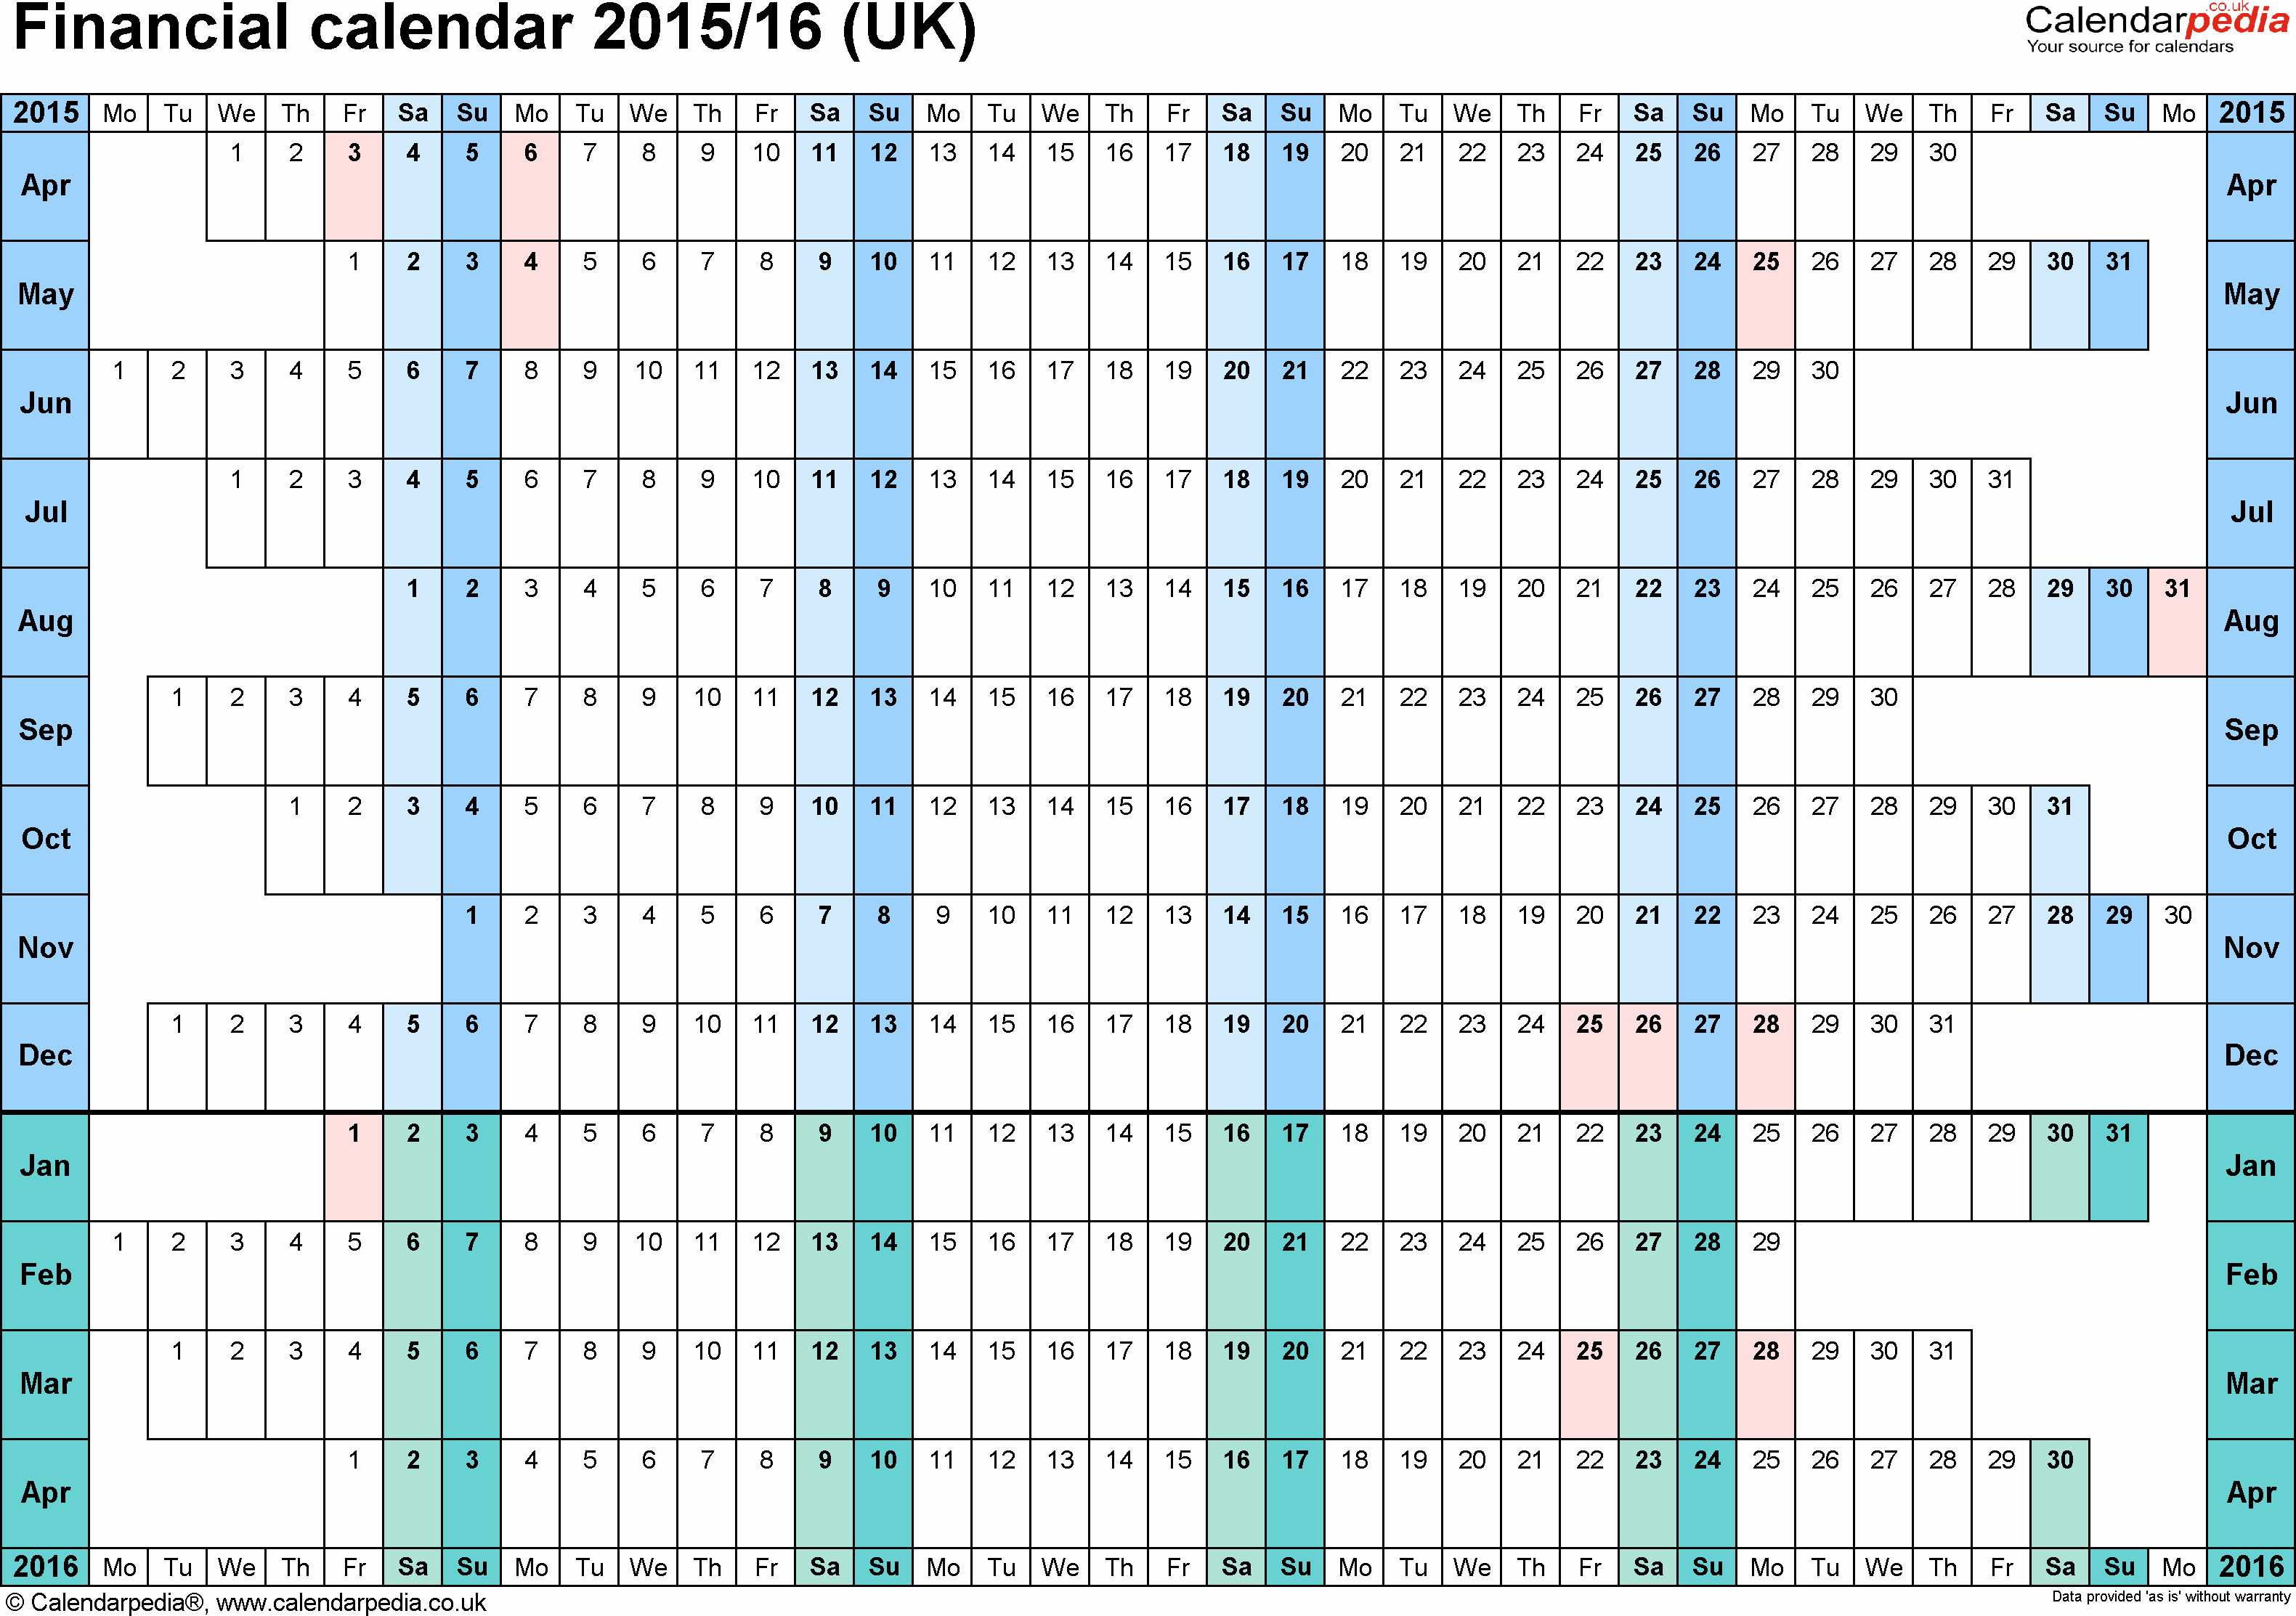 Blank Calendar 2016-17 Beautiful Financial Calendars 2015 16 Uk In Microsoft Word format